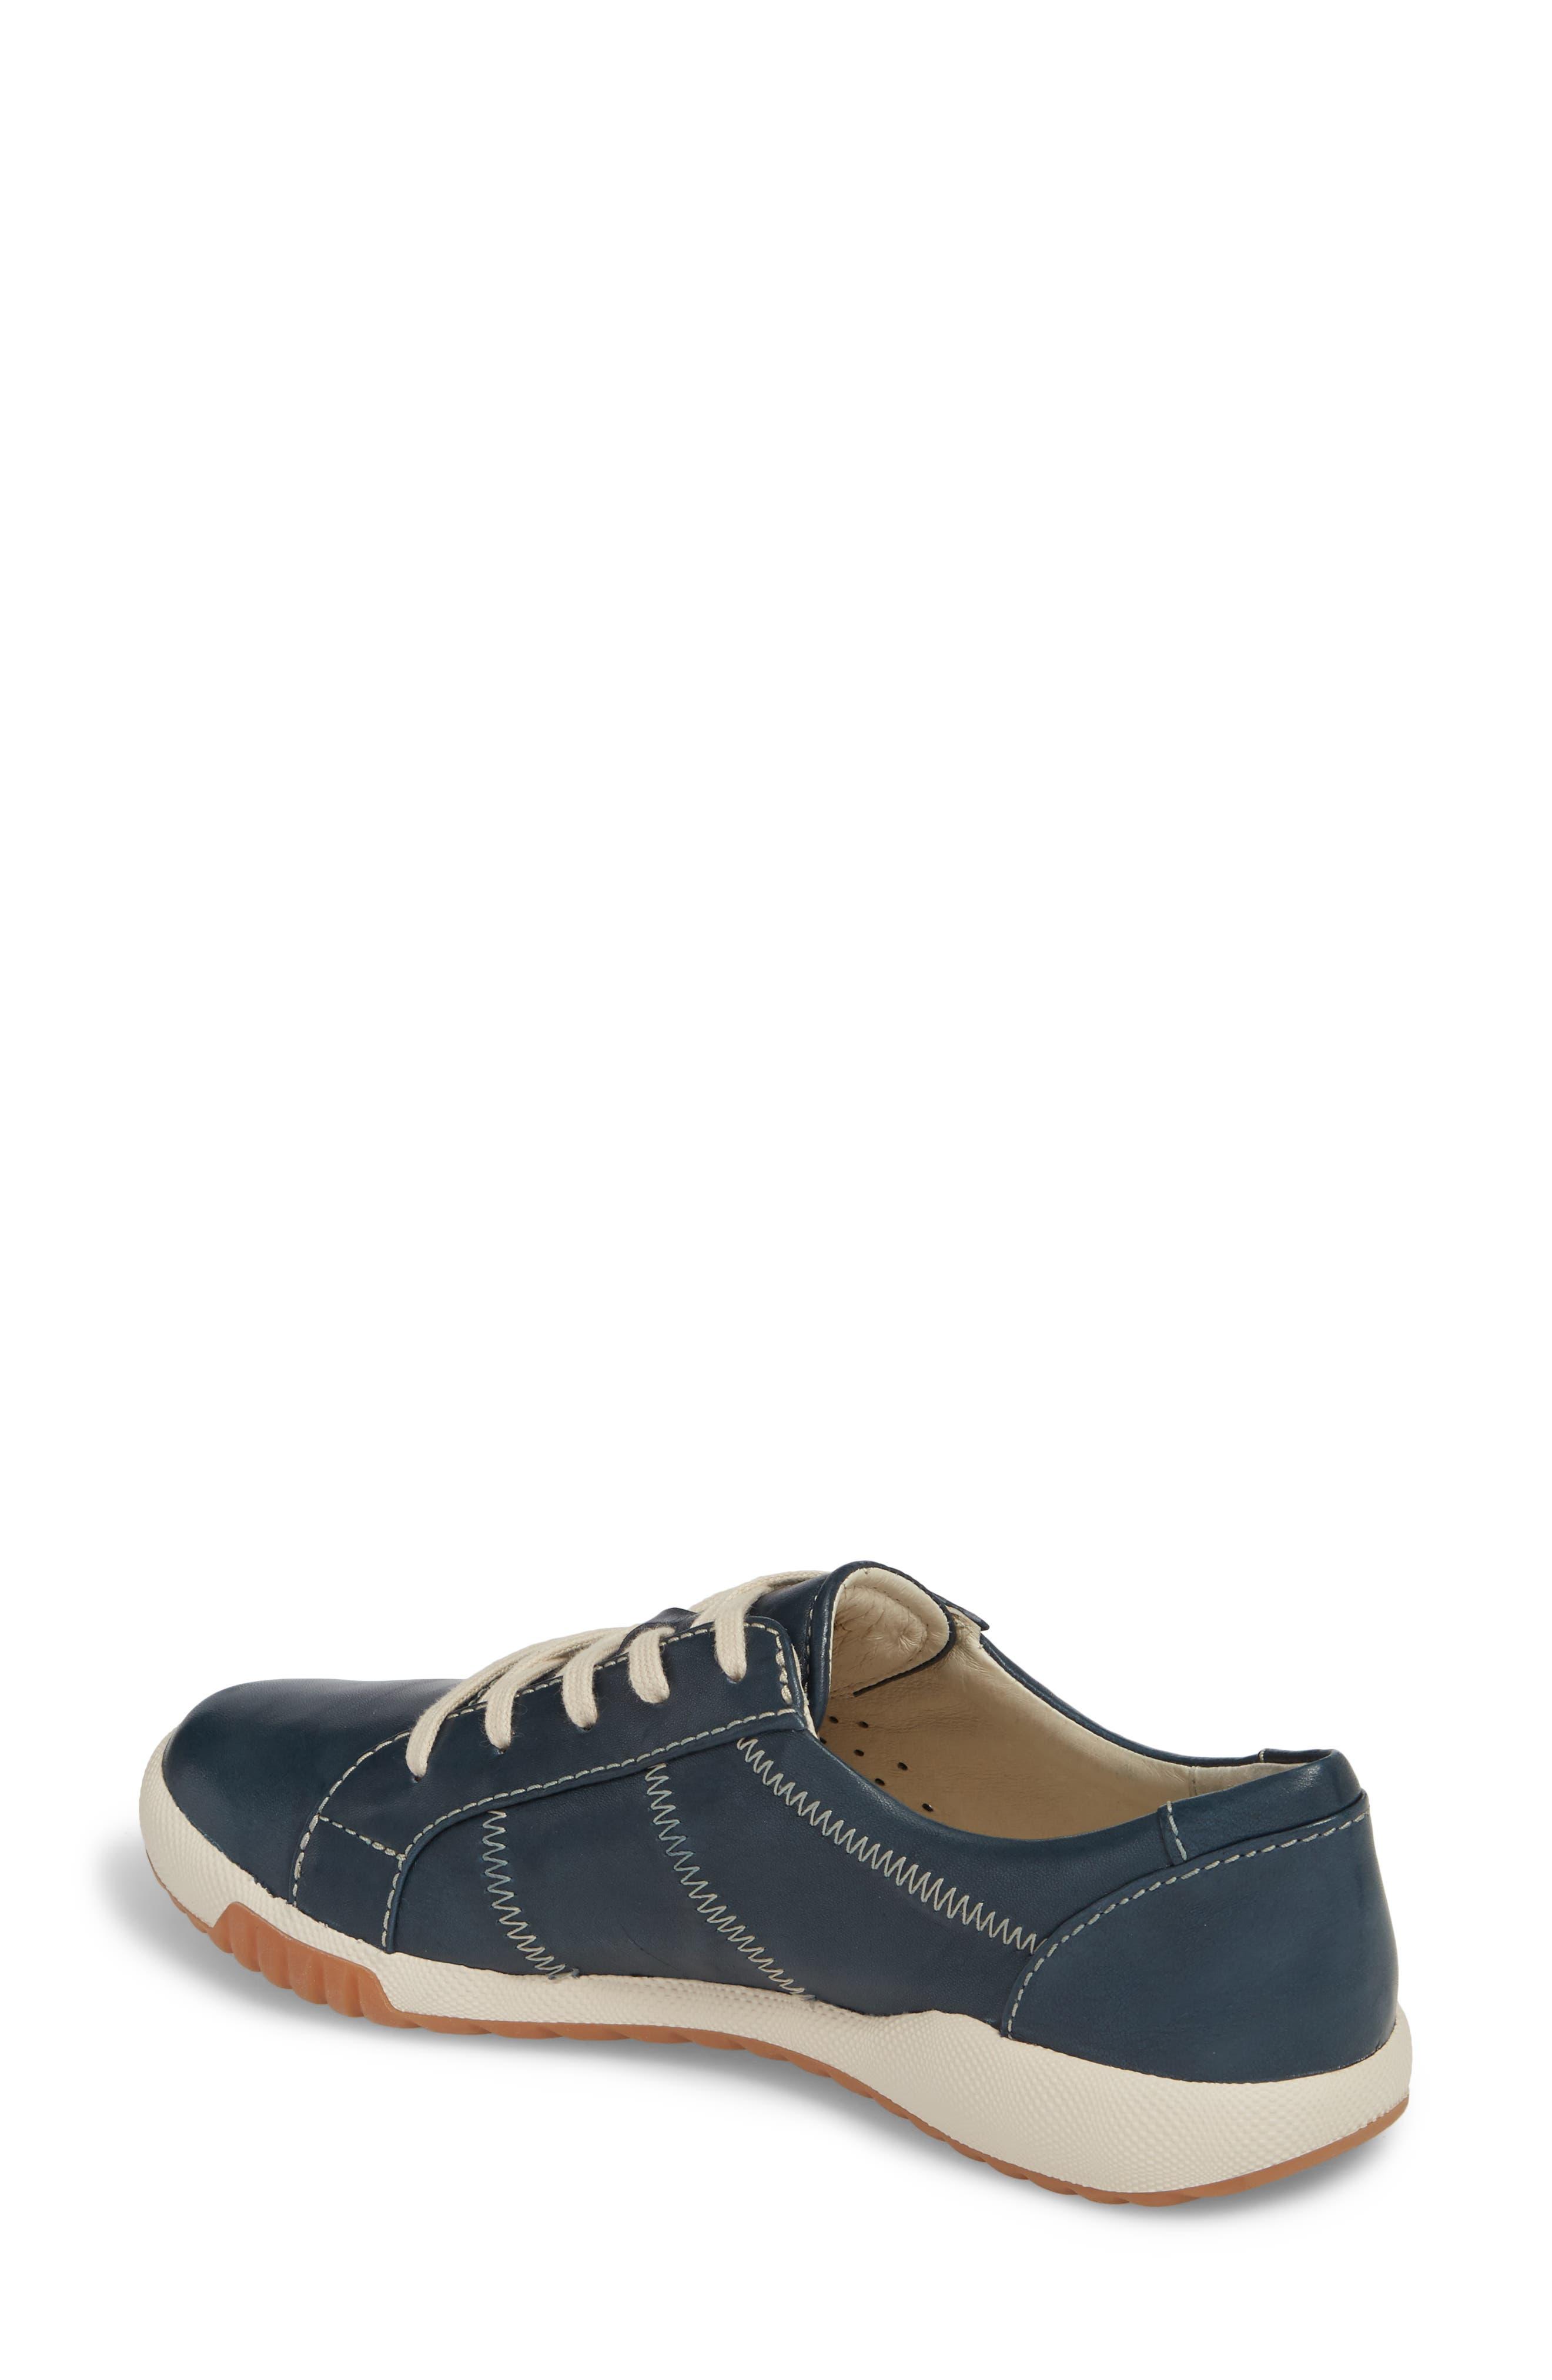 Cordoba 01 Sneaker,                             Alternate thumbnail 2, color,                             OCEAN LEATHER